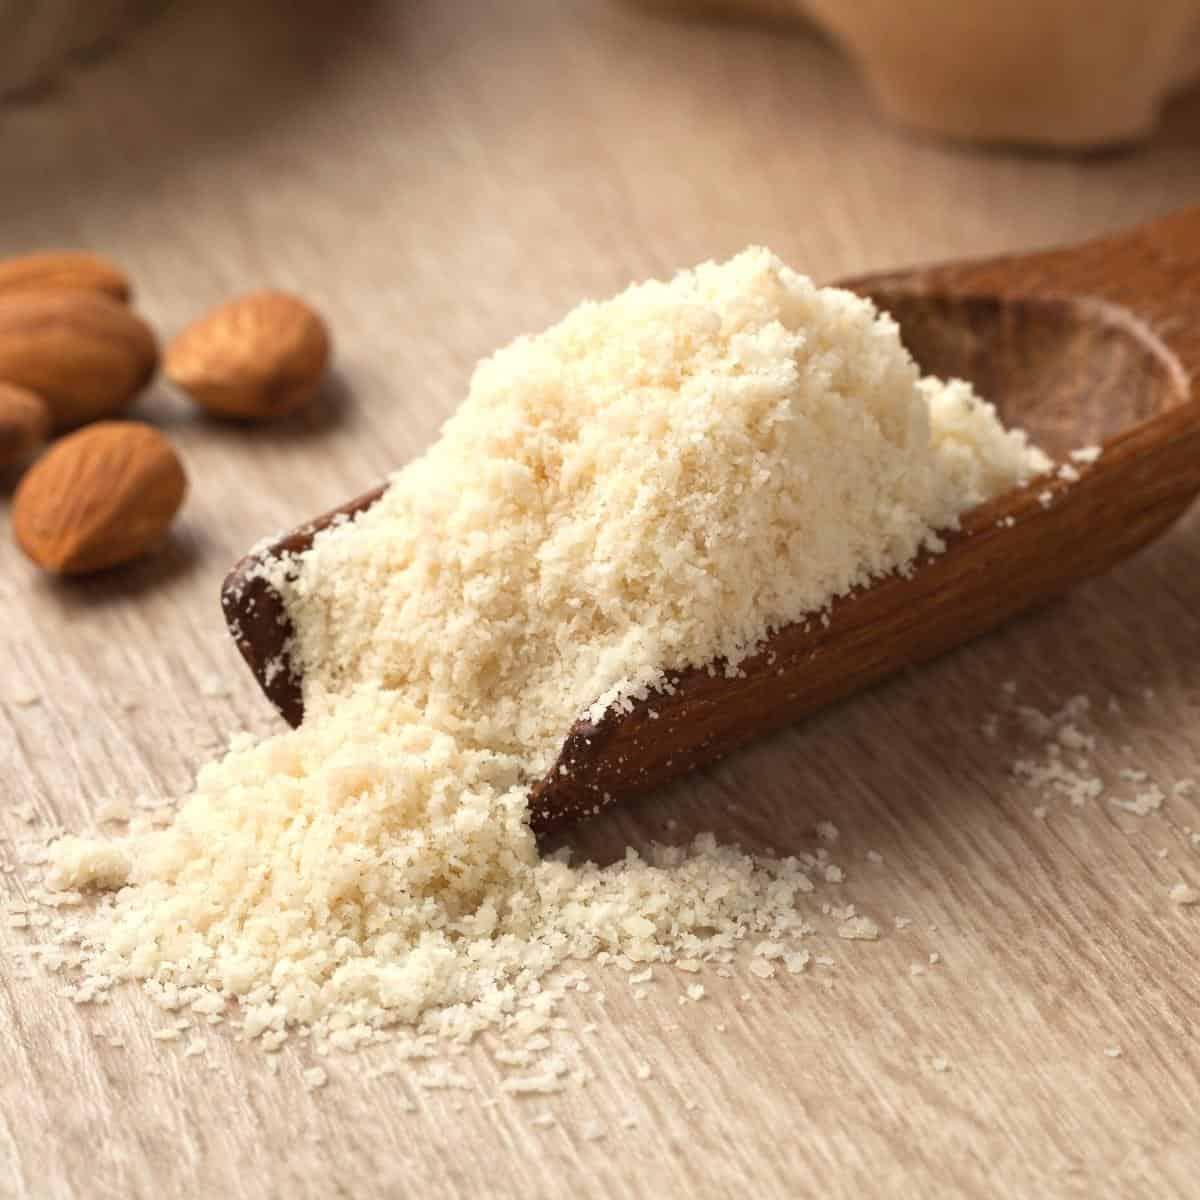 Almond flour in a measuring spoon.